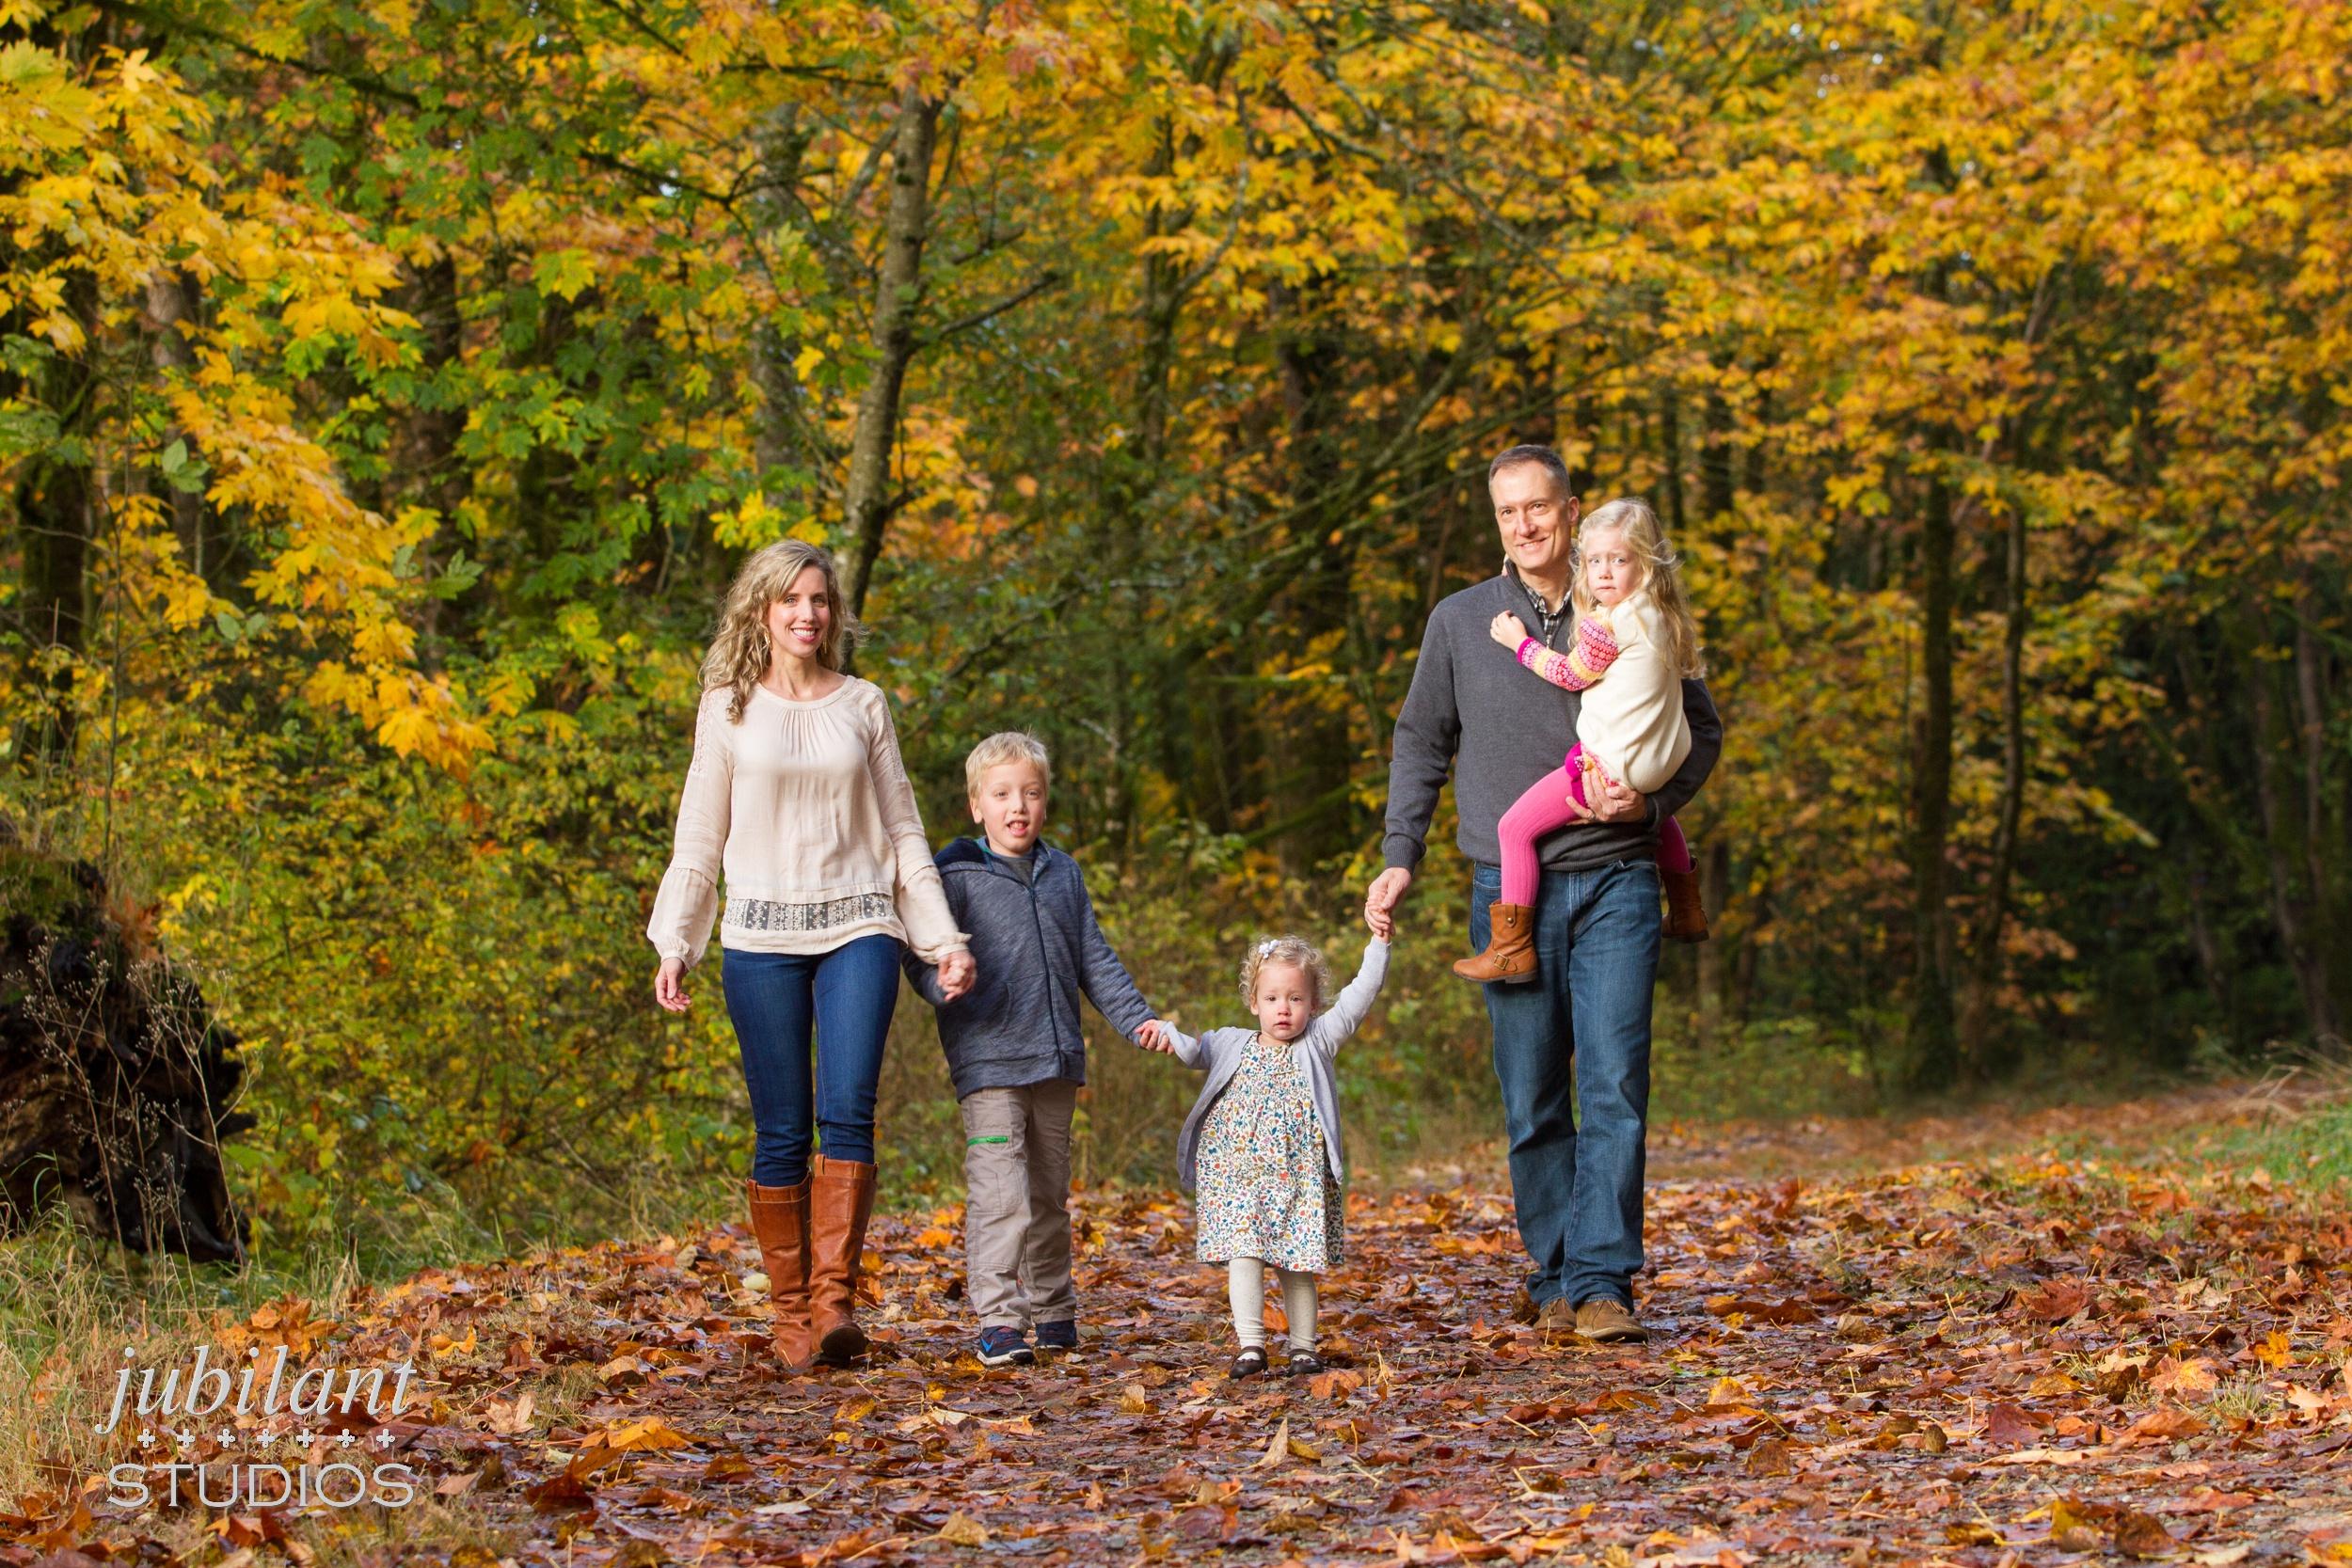 Issaquah Fall Family Photo